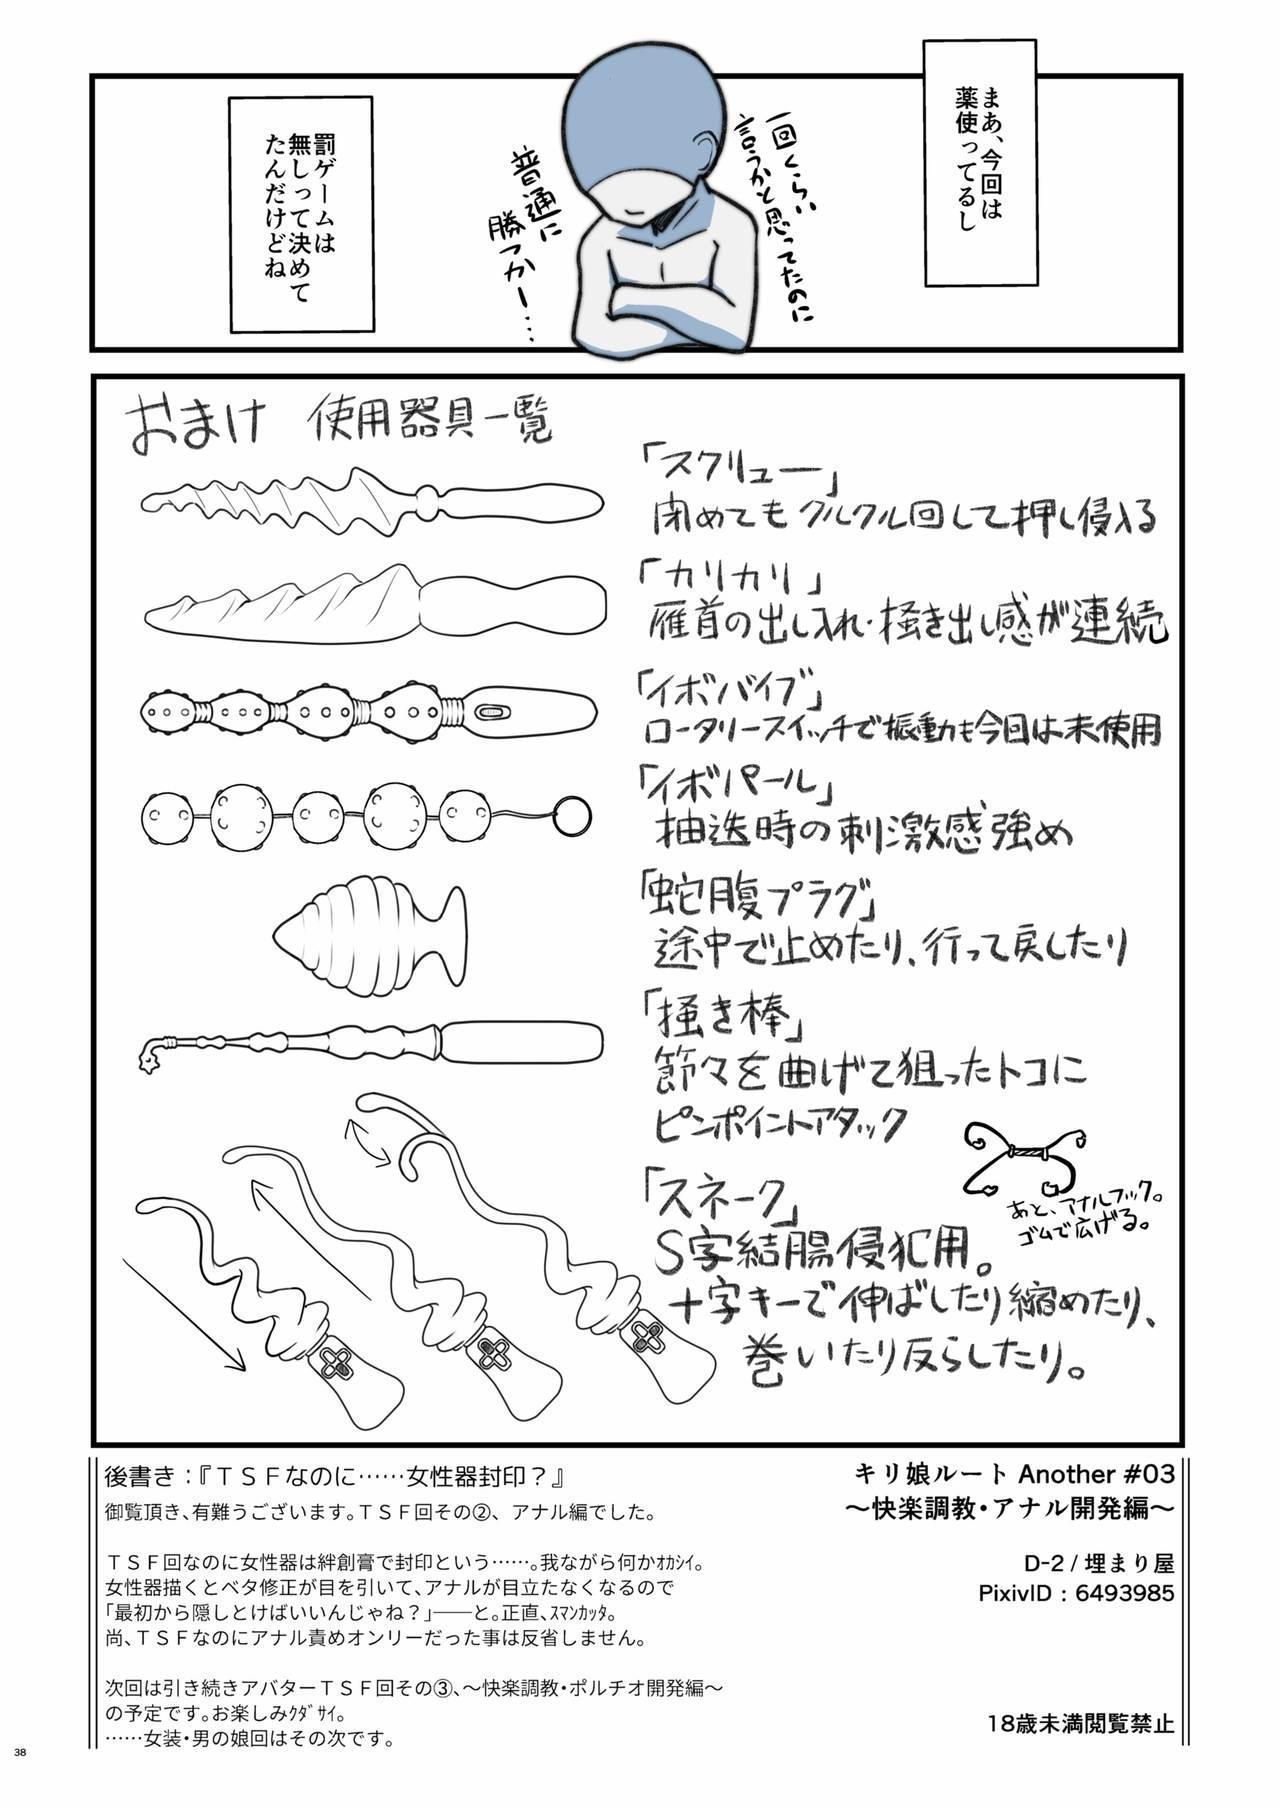 Kiriko Route Another A Part Set 100